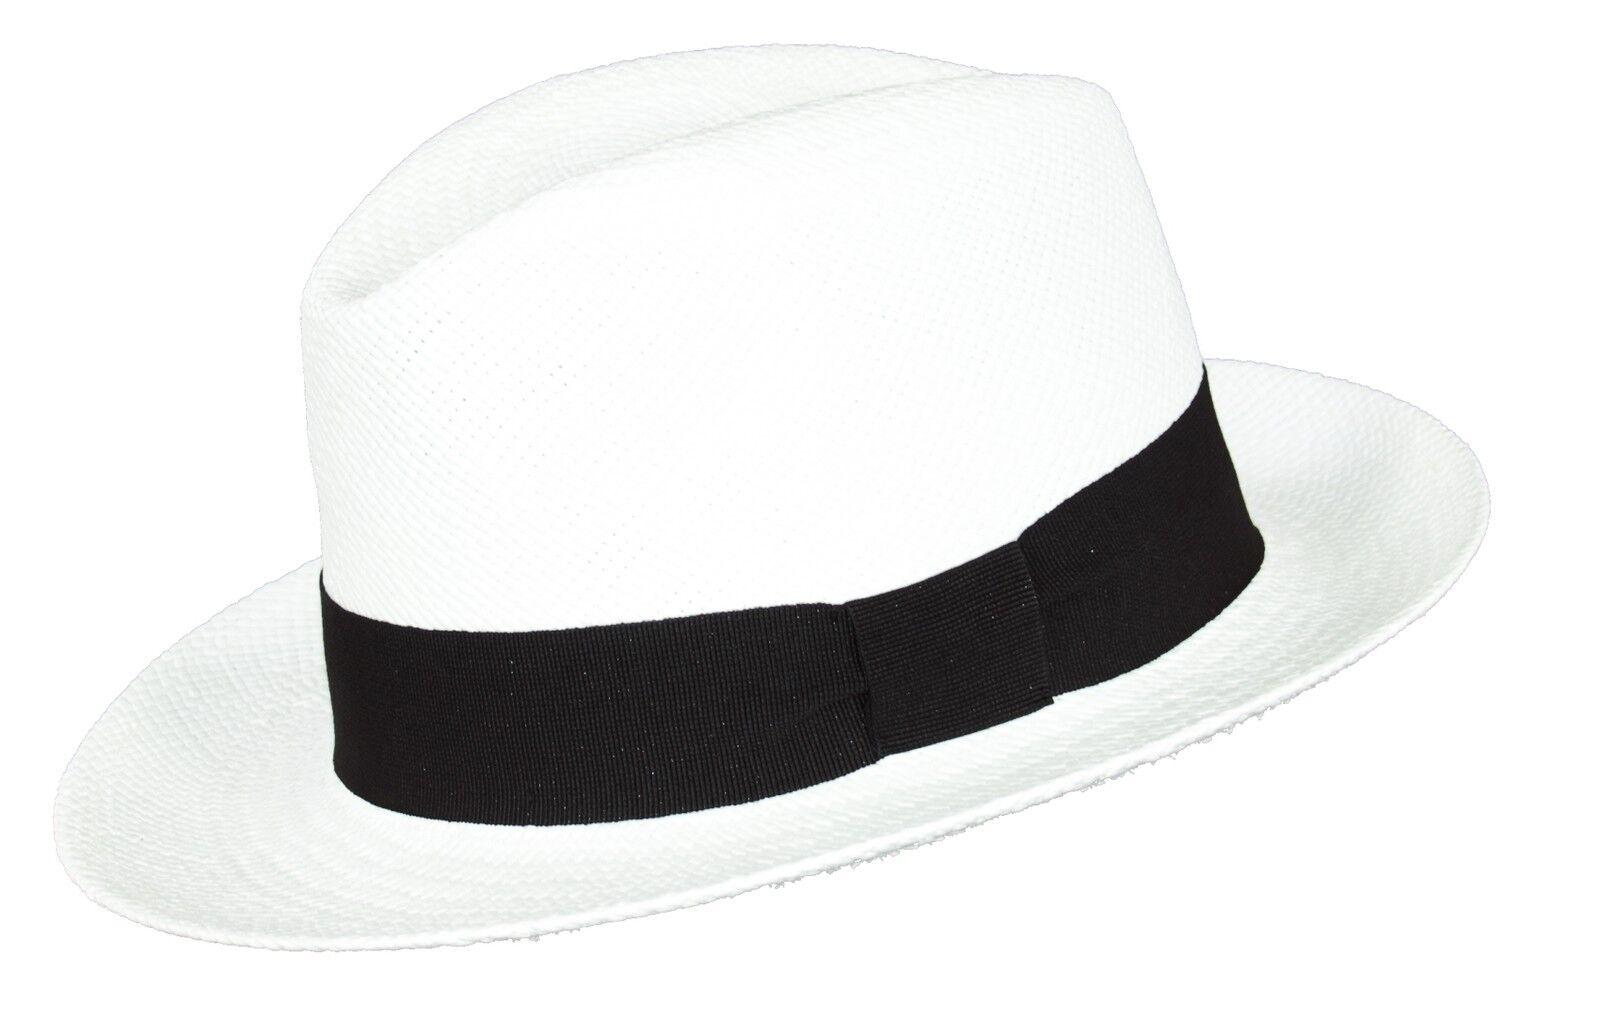 Hochwertiger PANAMAHUT Hut handgefertigt aus 100% 100% 100% PANAMA-Stroh weiß | Online-Exportgeschäft  389a4c